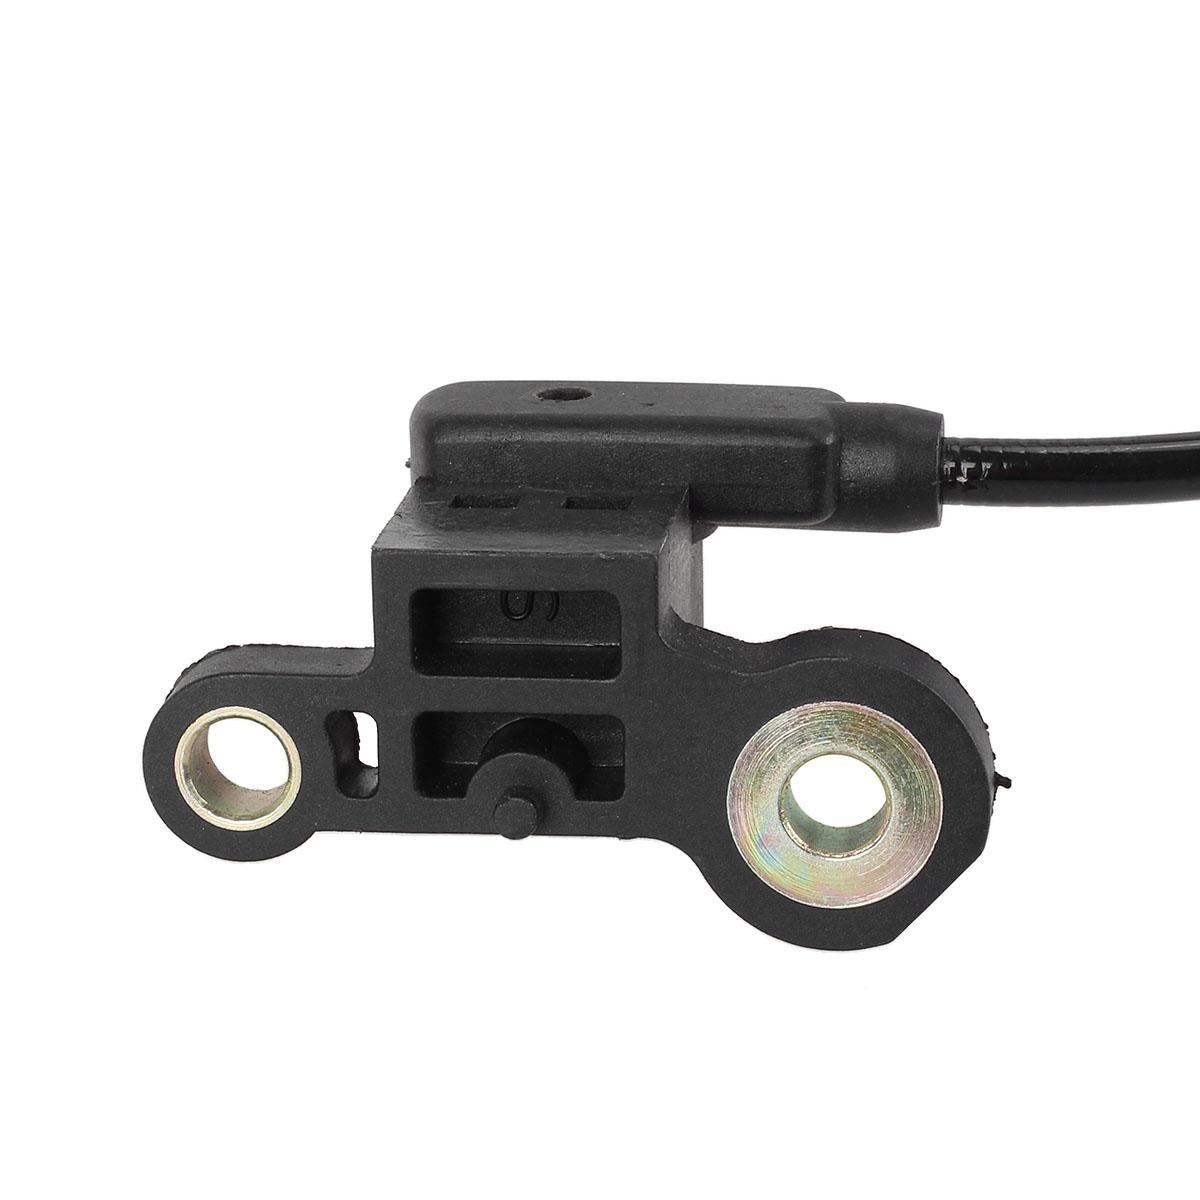 For 1999-2003 Mazda Protege 2.0L SU4309 Crank Crankshaft